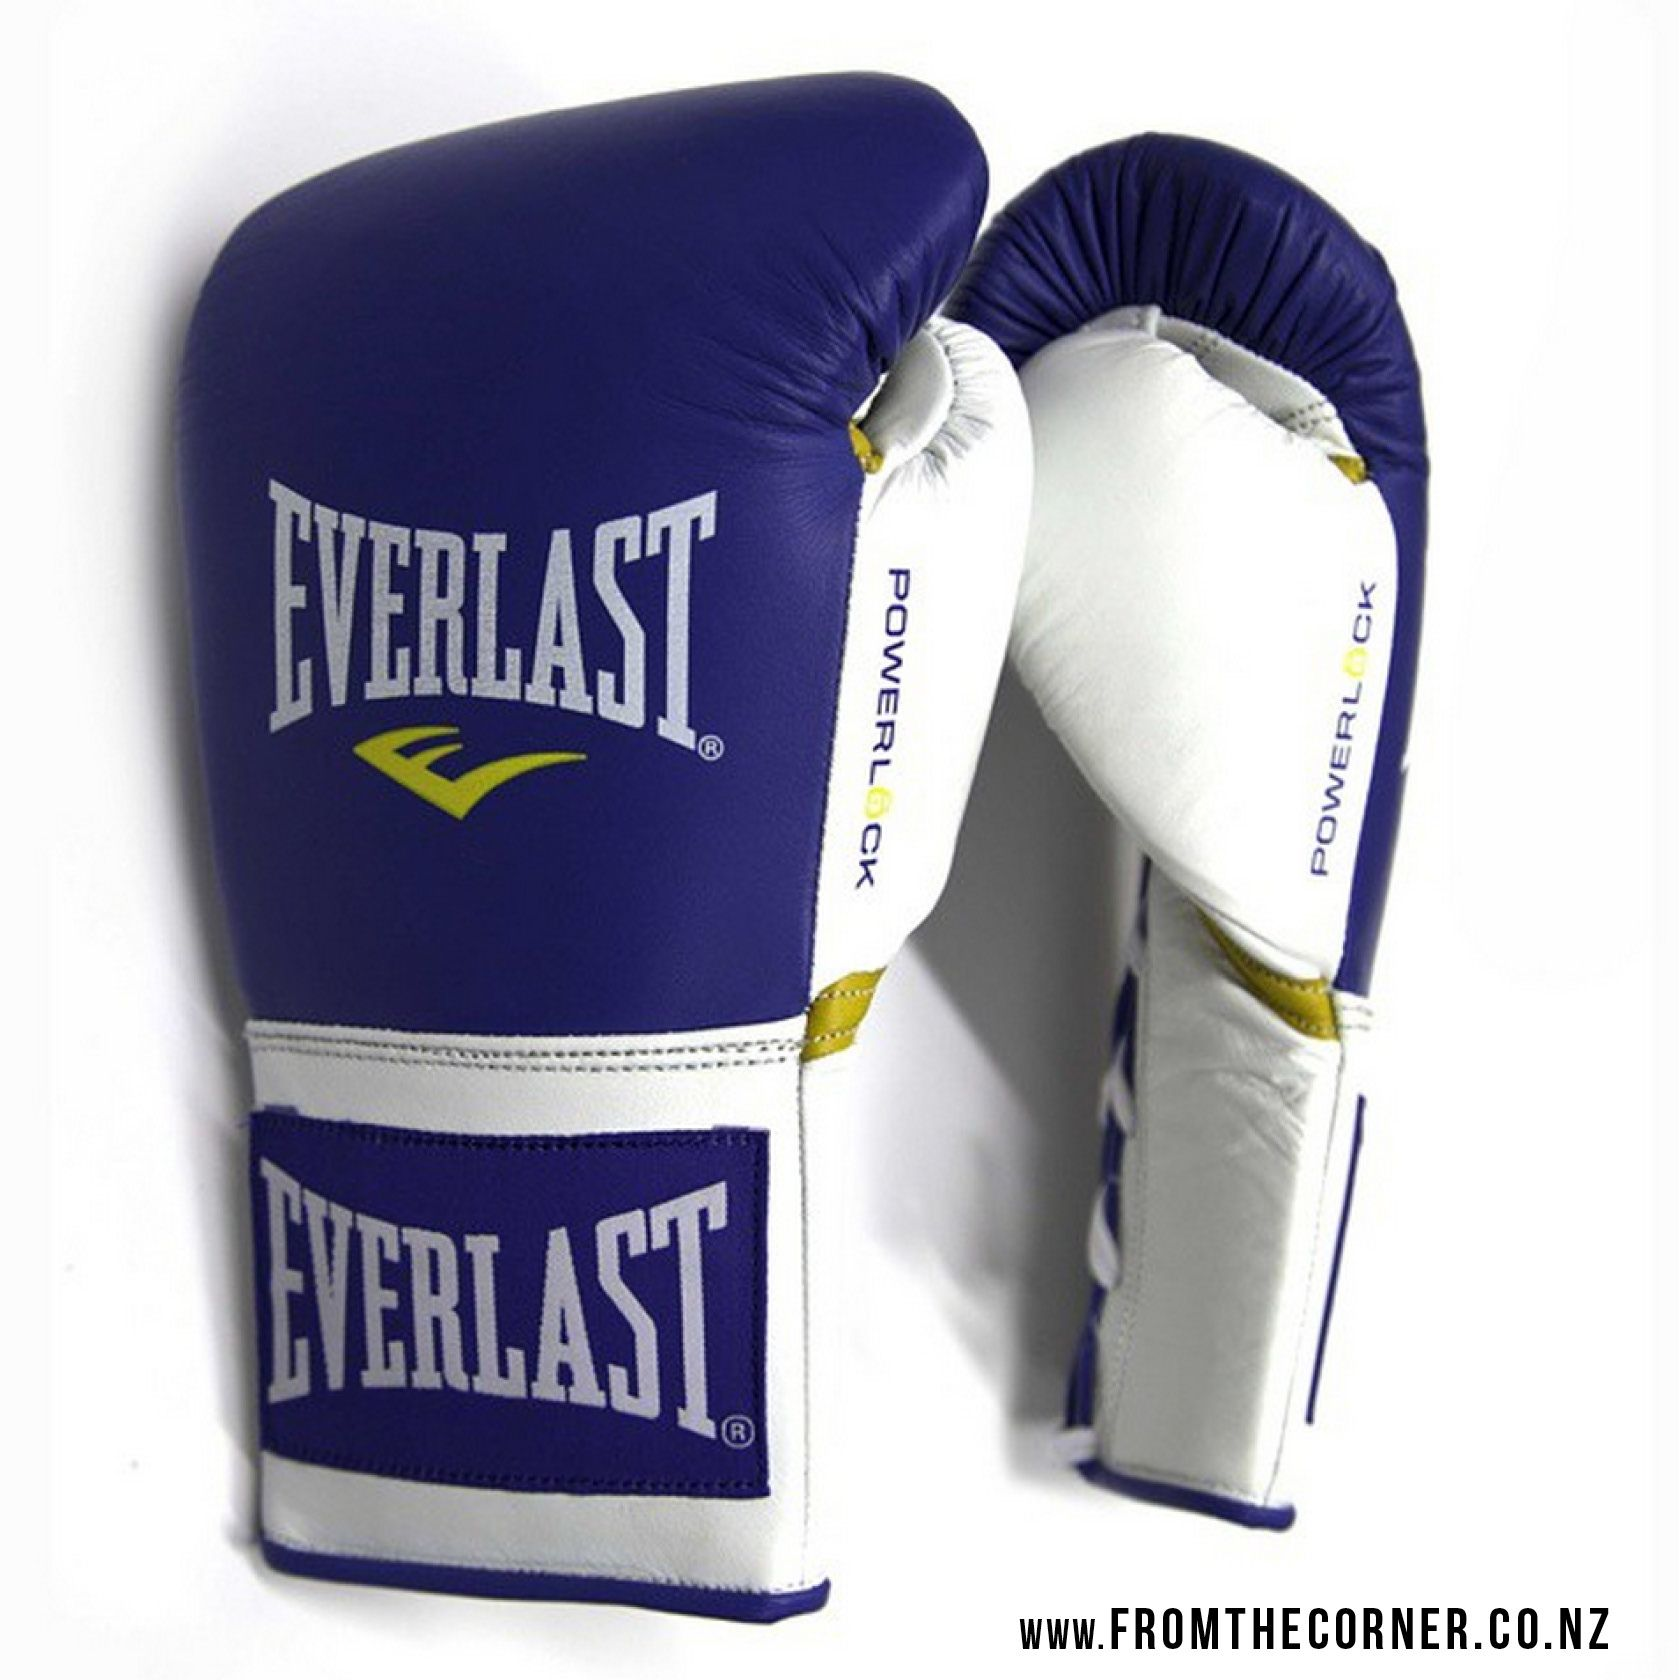 Personalized Fitness Gloves: Custom-made Everlast PowerLock Boxing Gloves Made For